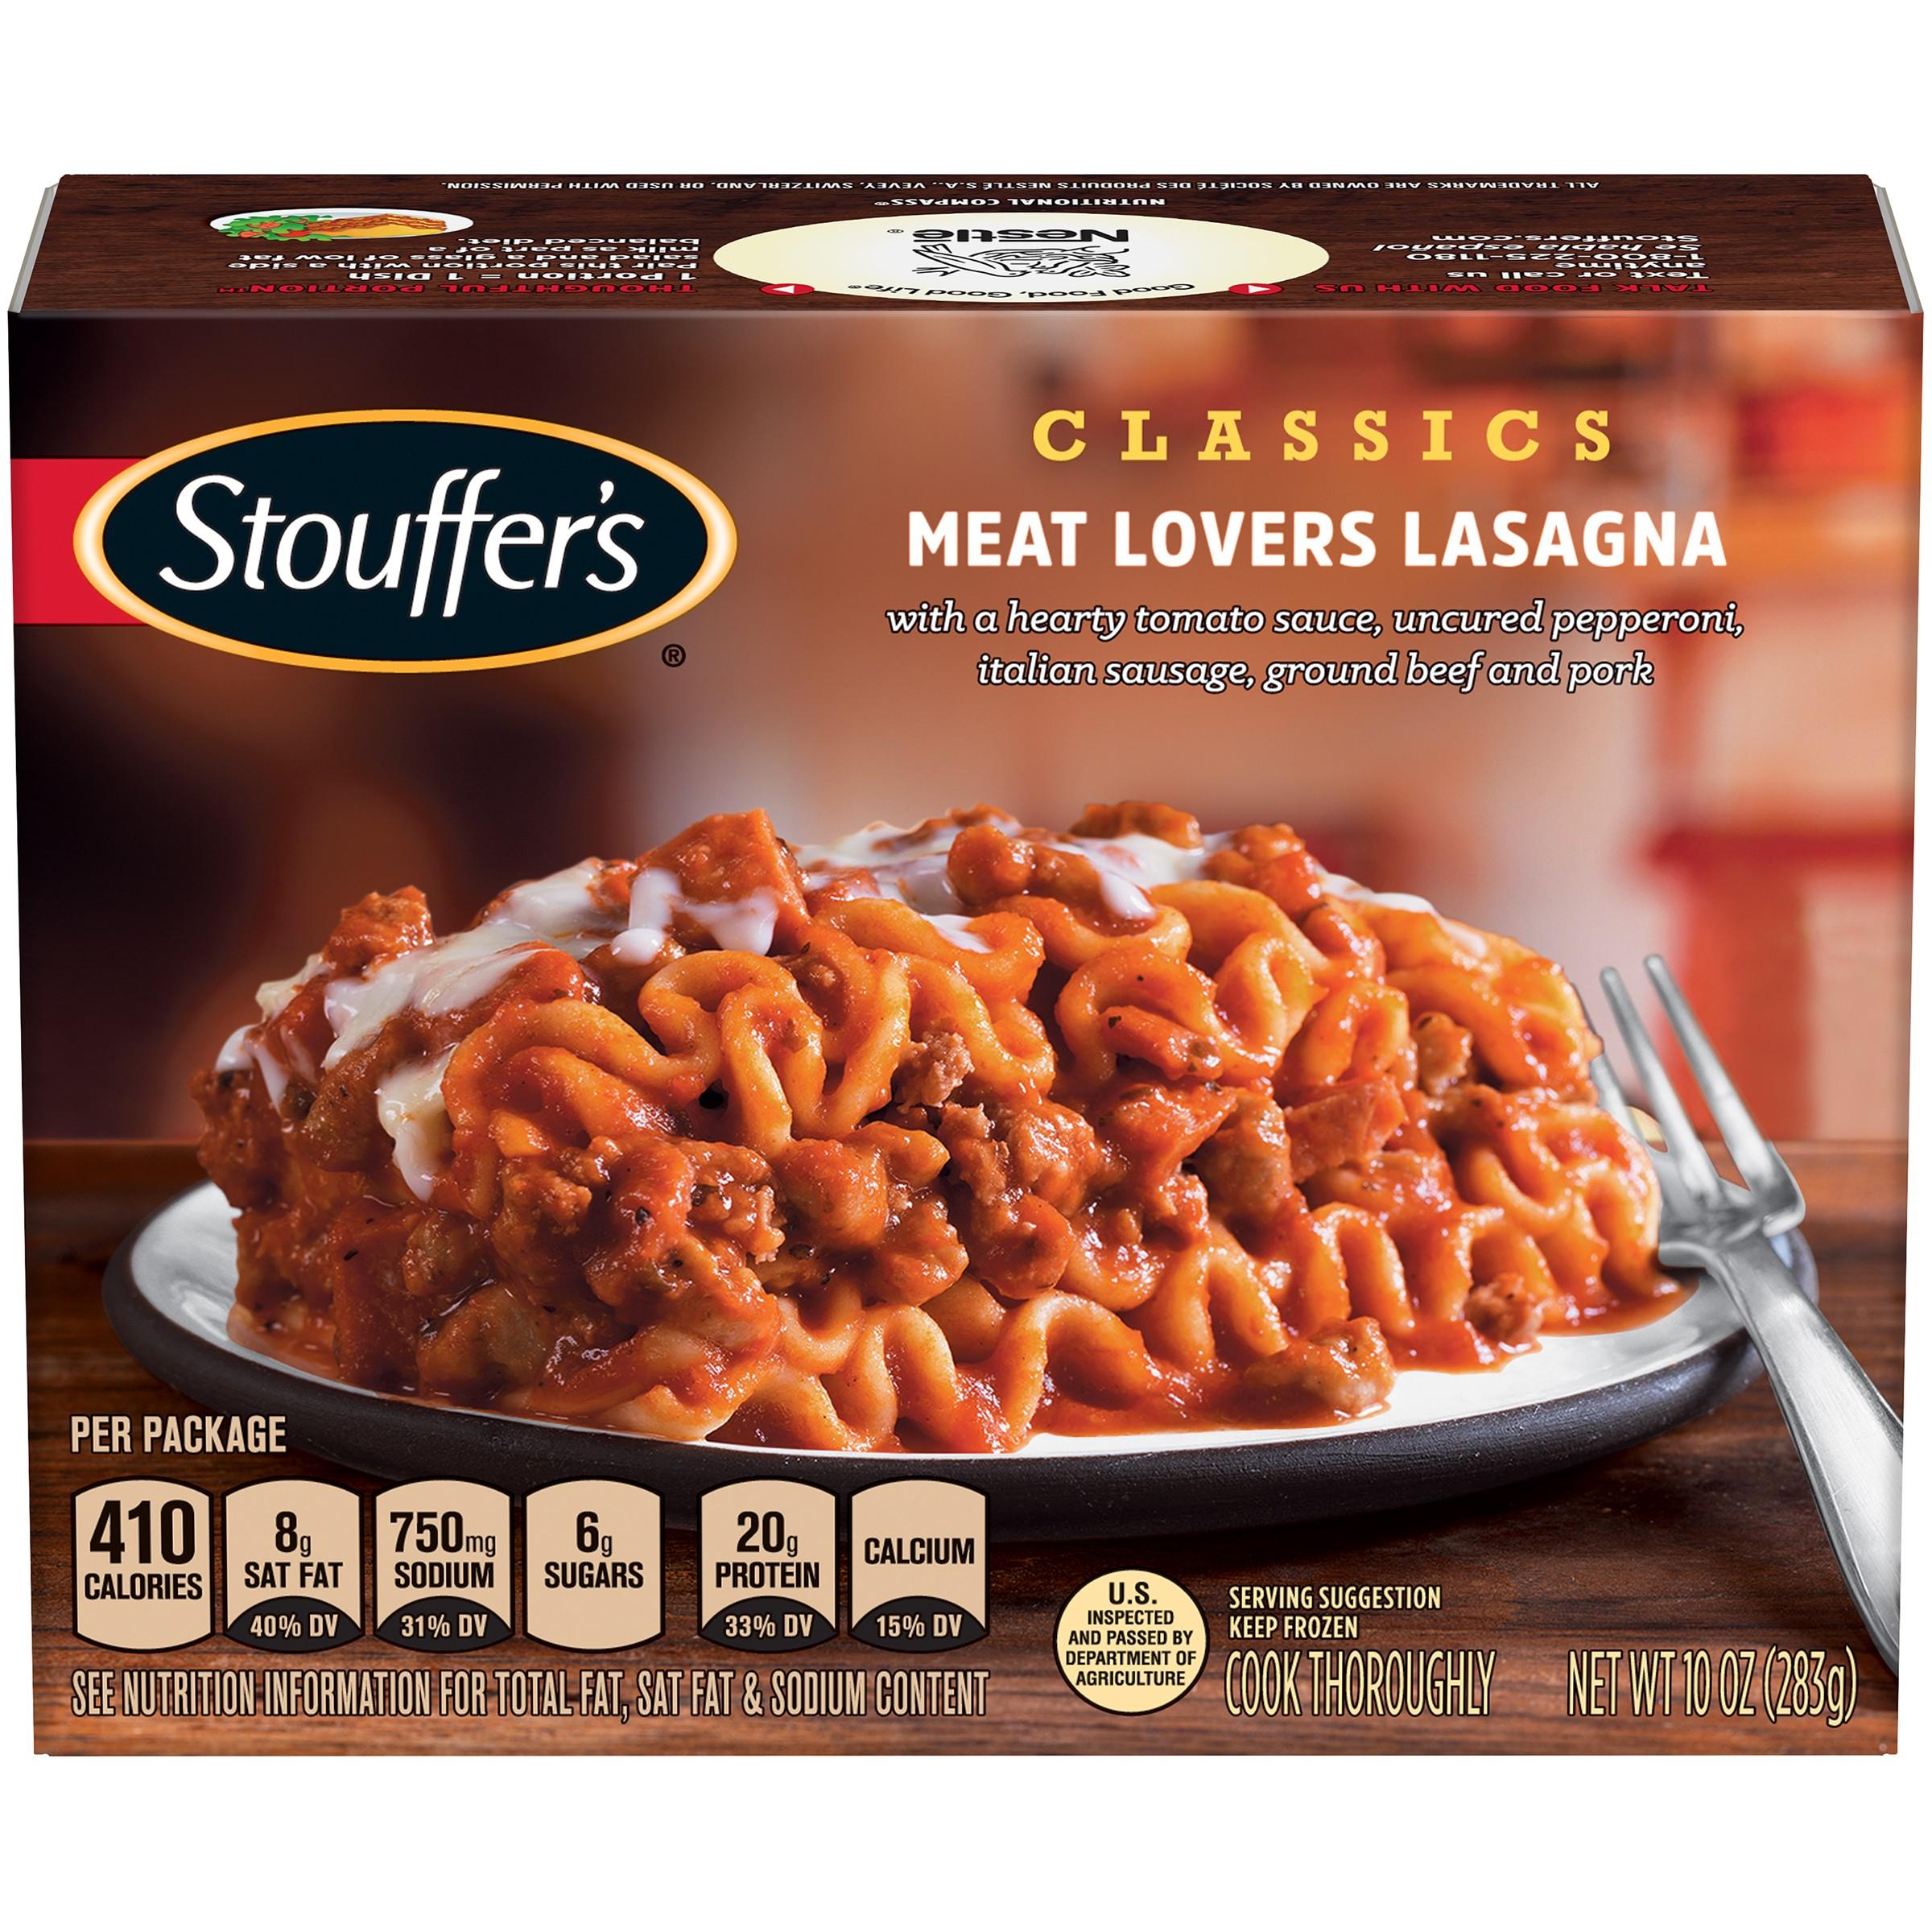 STOUFFER'S CLASSICS Meat Lovers Lasagna 10 oz. Box